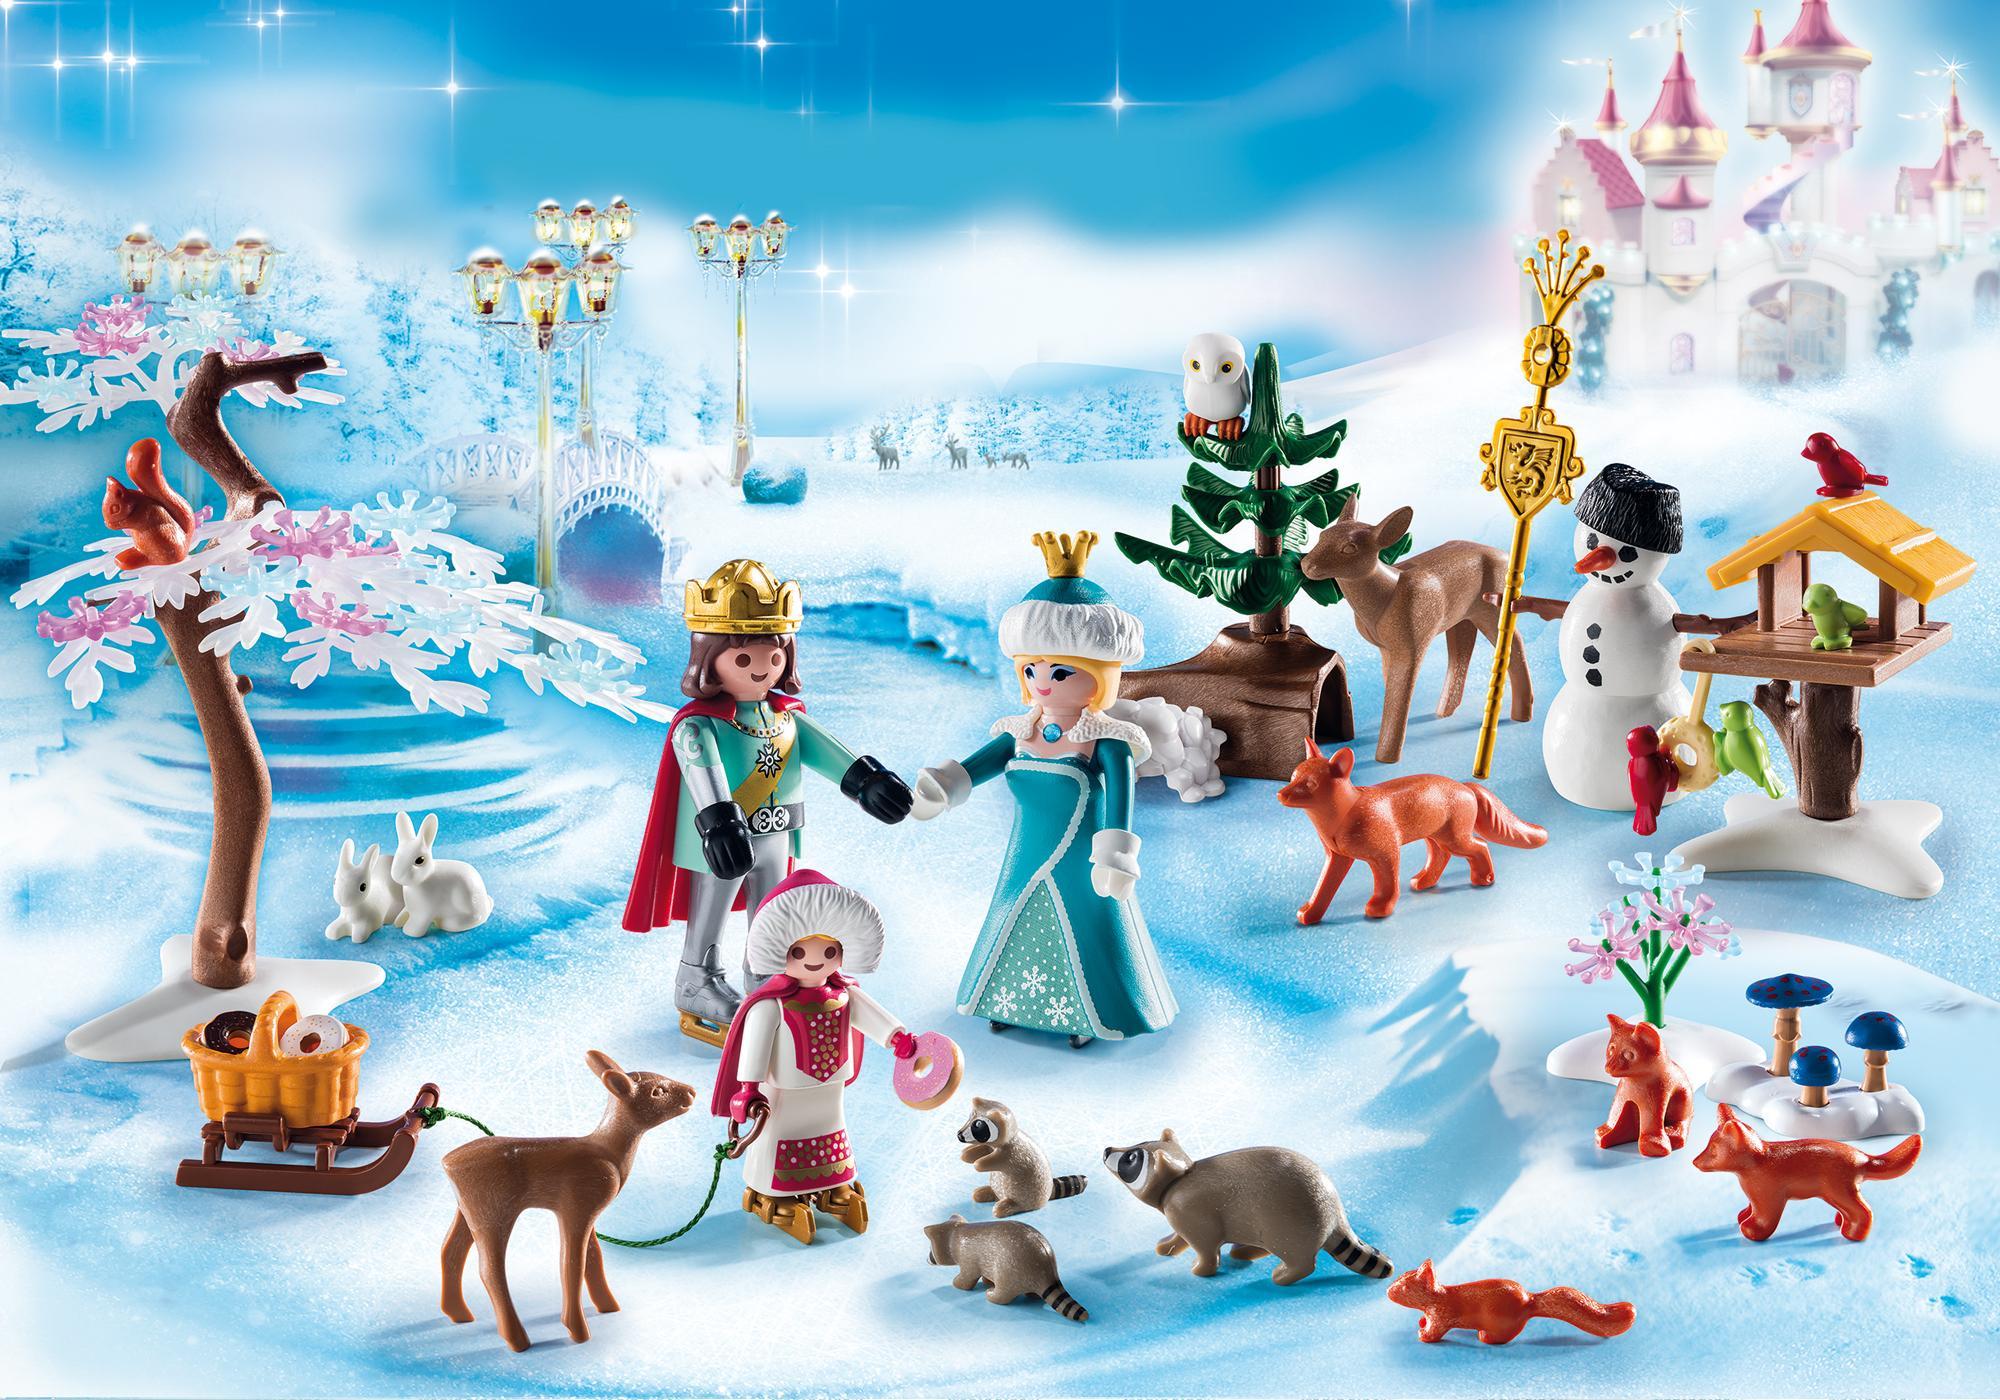 http://media.playmobil.com/i/playmobil/9008_product_extra1/Advent Calender Royal Ice Skating Trip